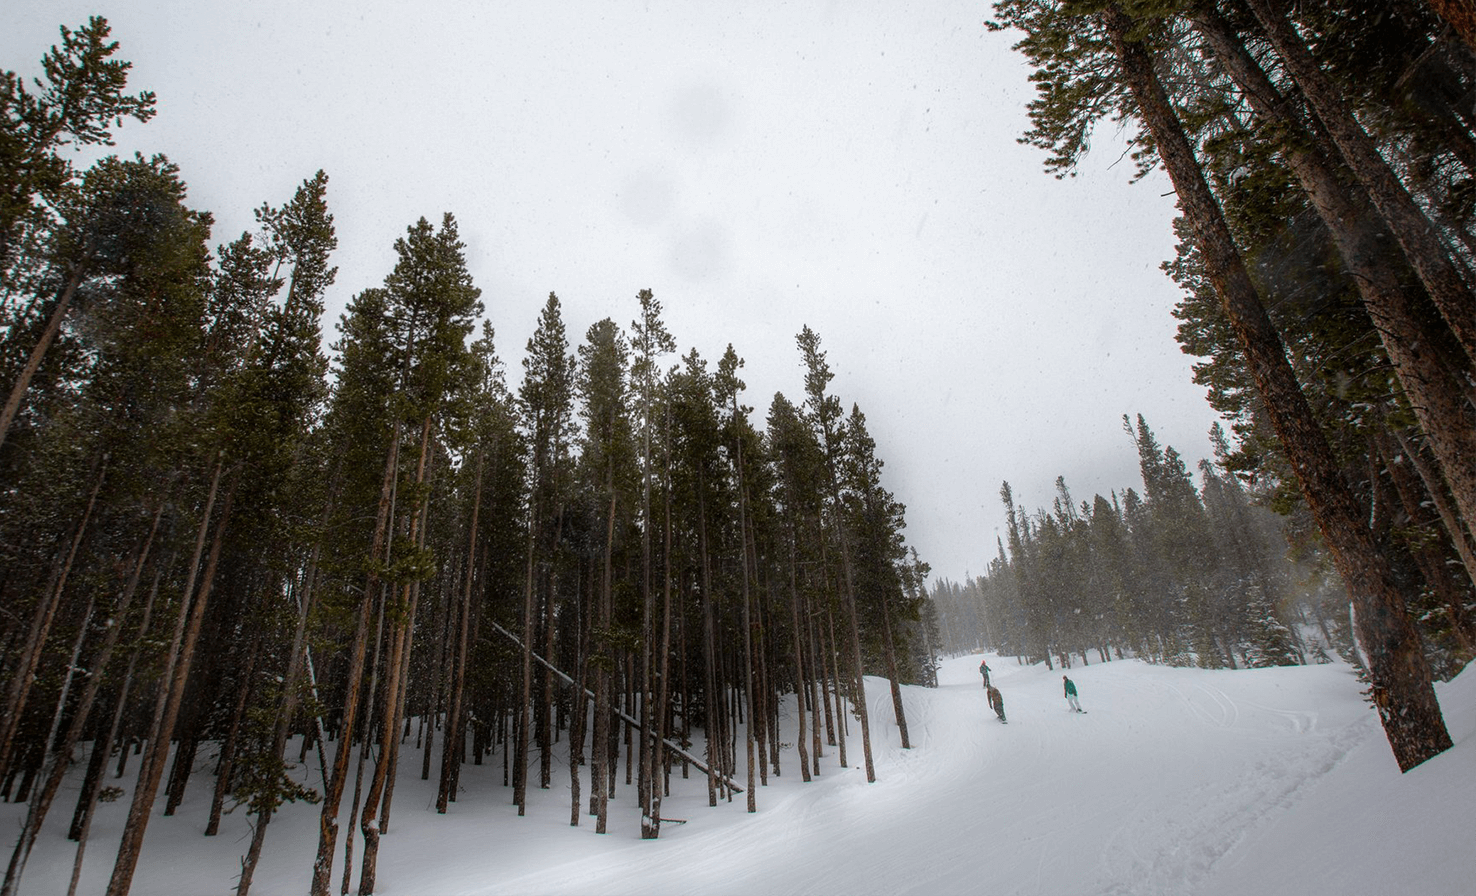 downhill skiiers traversing path